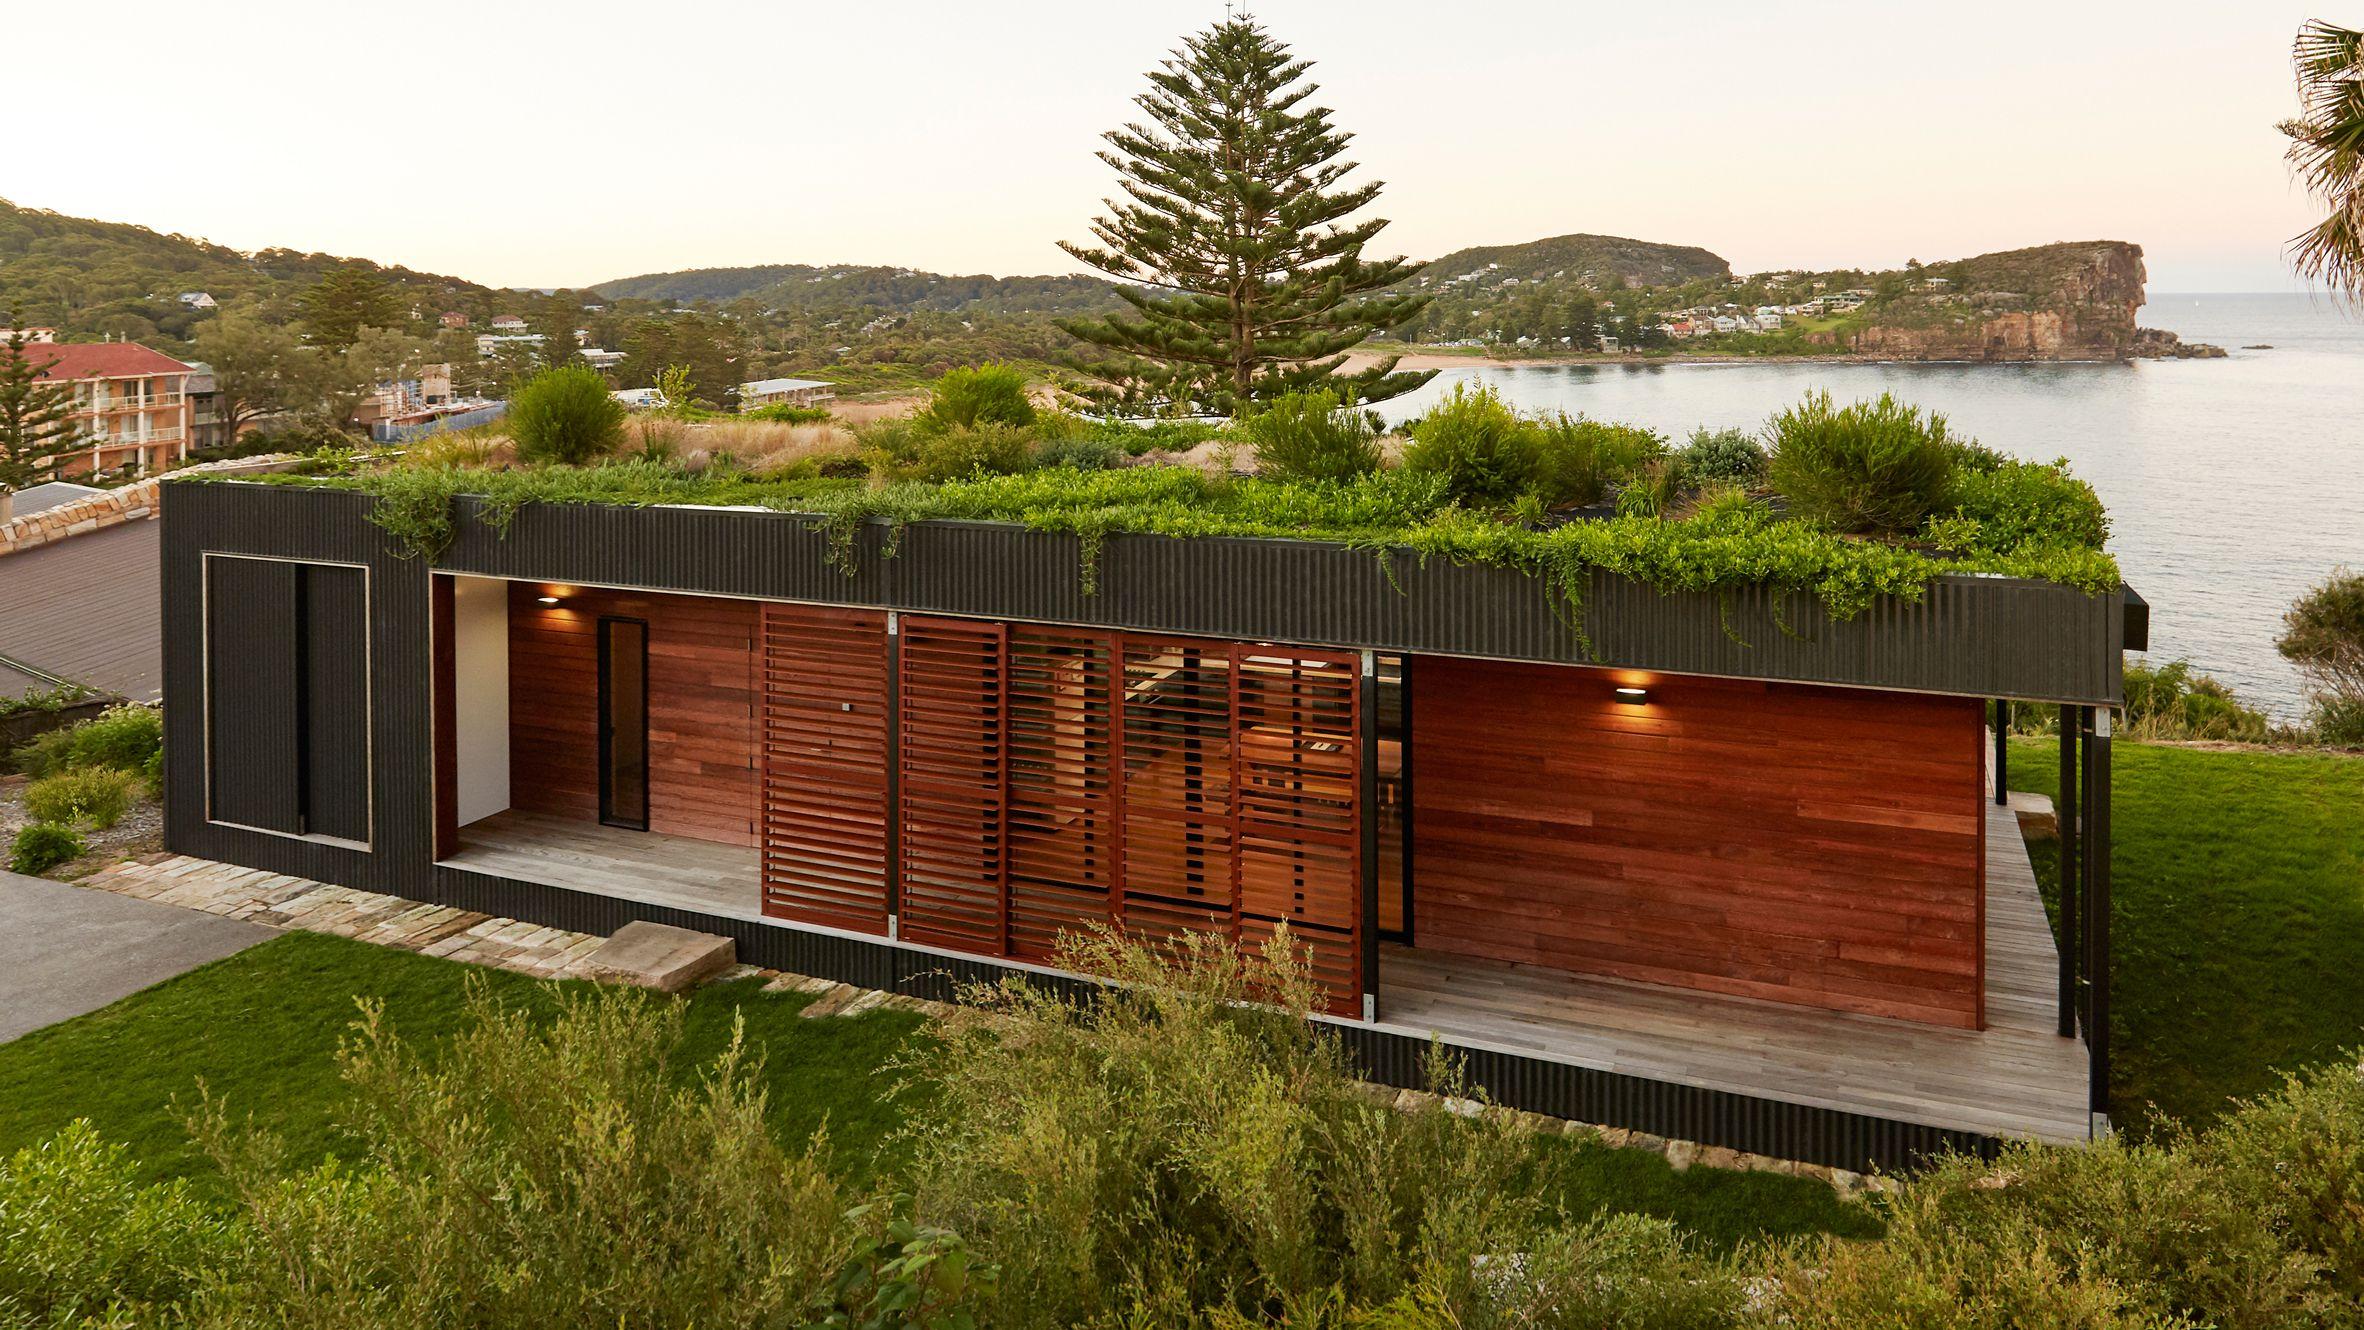 Archiblox Gave This Prefabricated Beachfront House Near